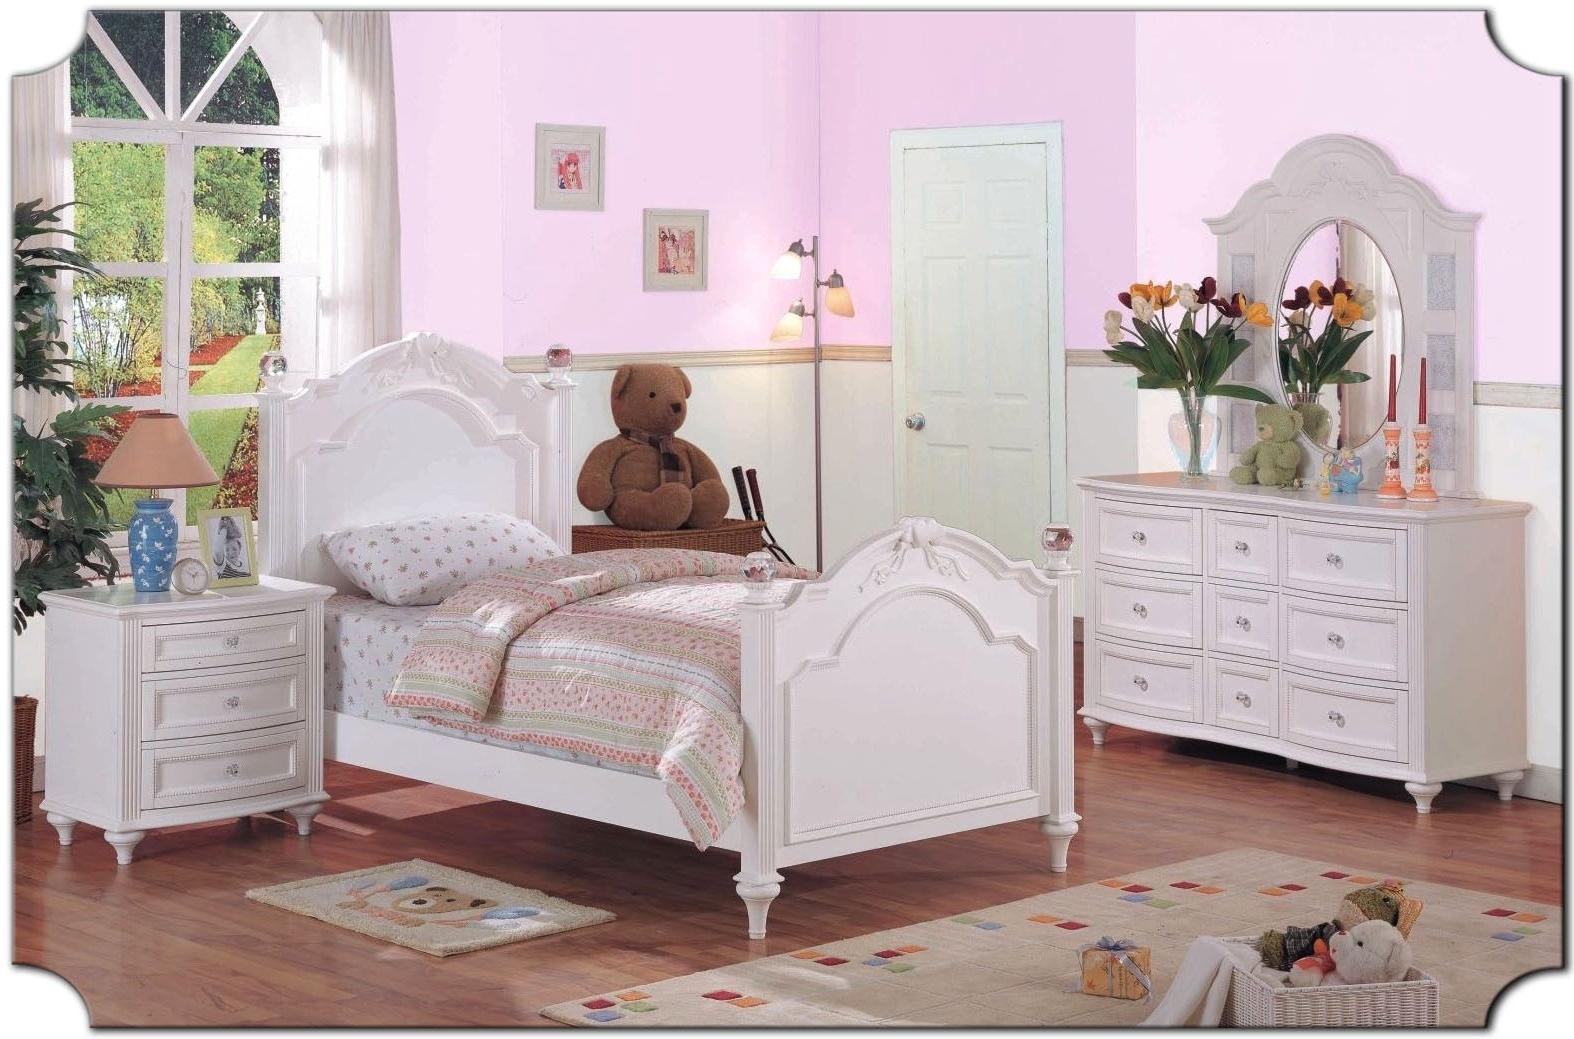 childrens bedroom furniture sets ikea photo - 8